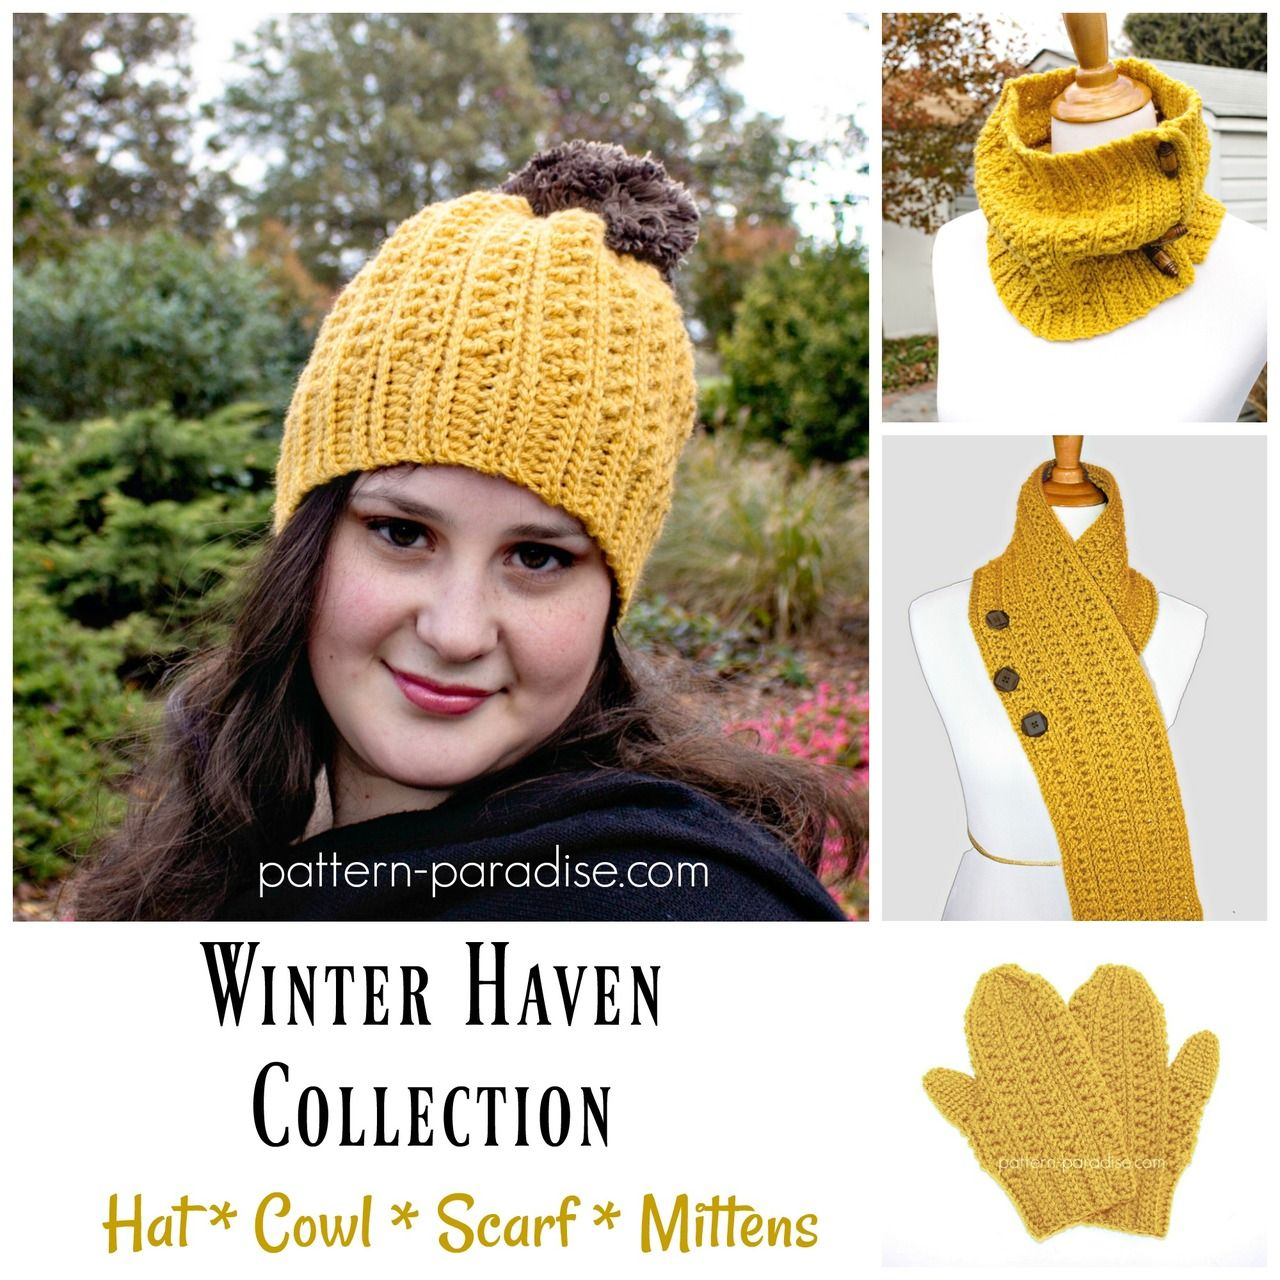 Crochet Pattern: Winter Haven Collection | Pattern Paradise - https ...